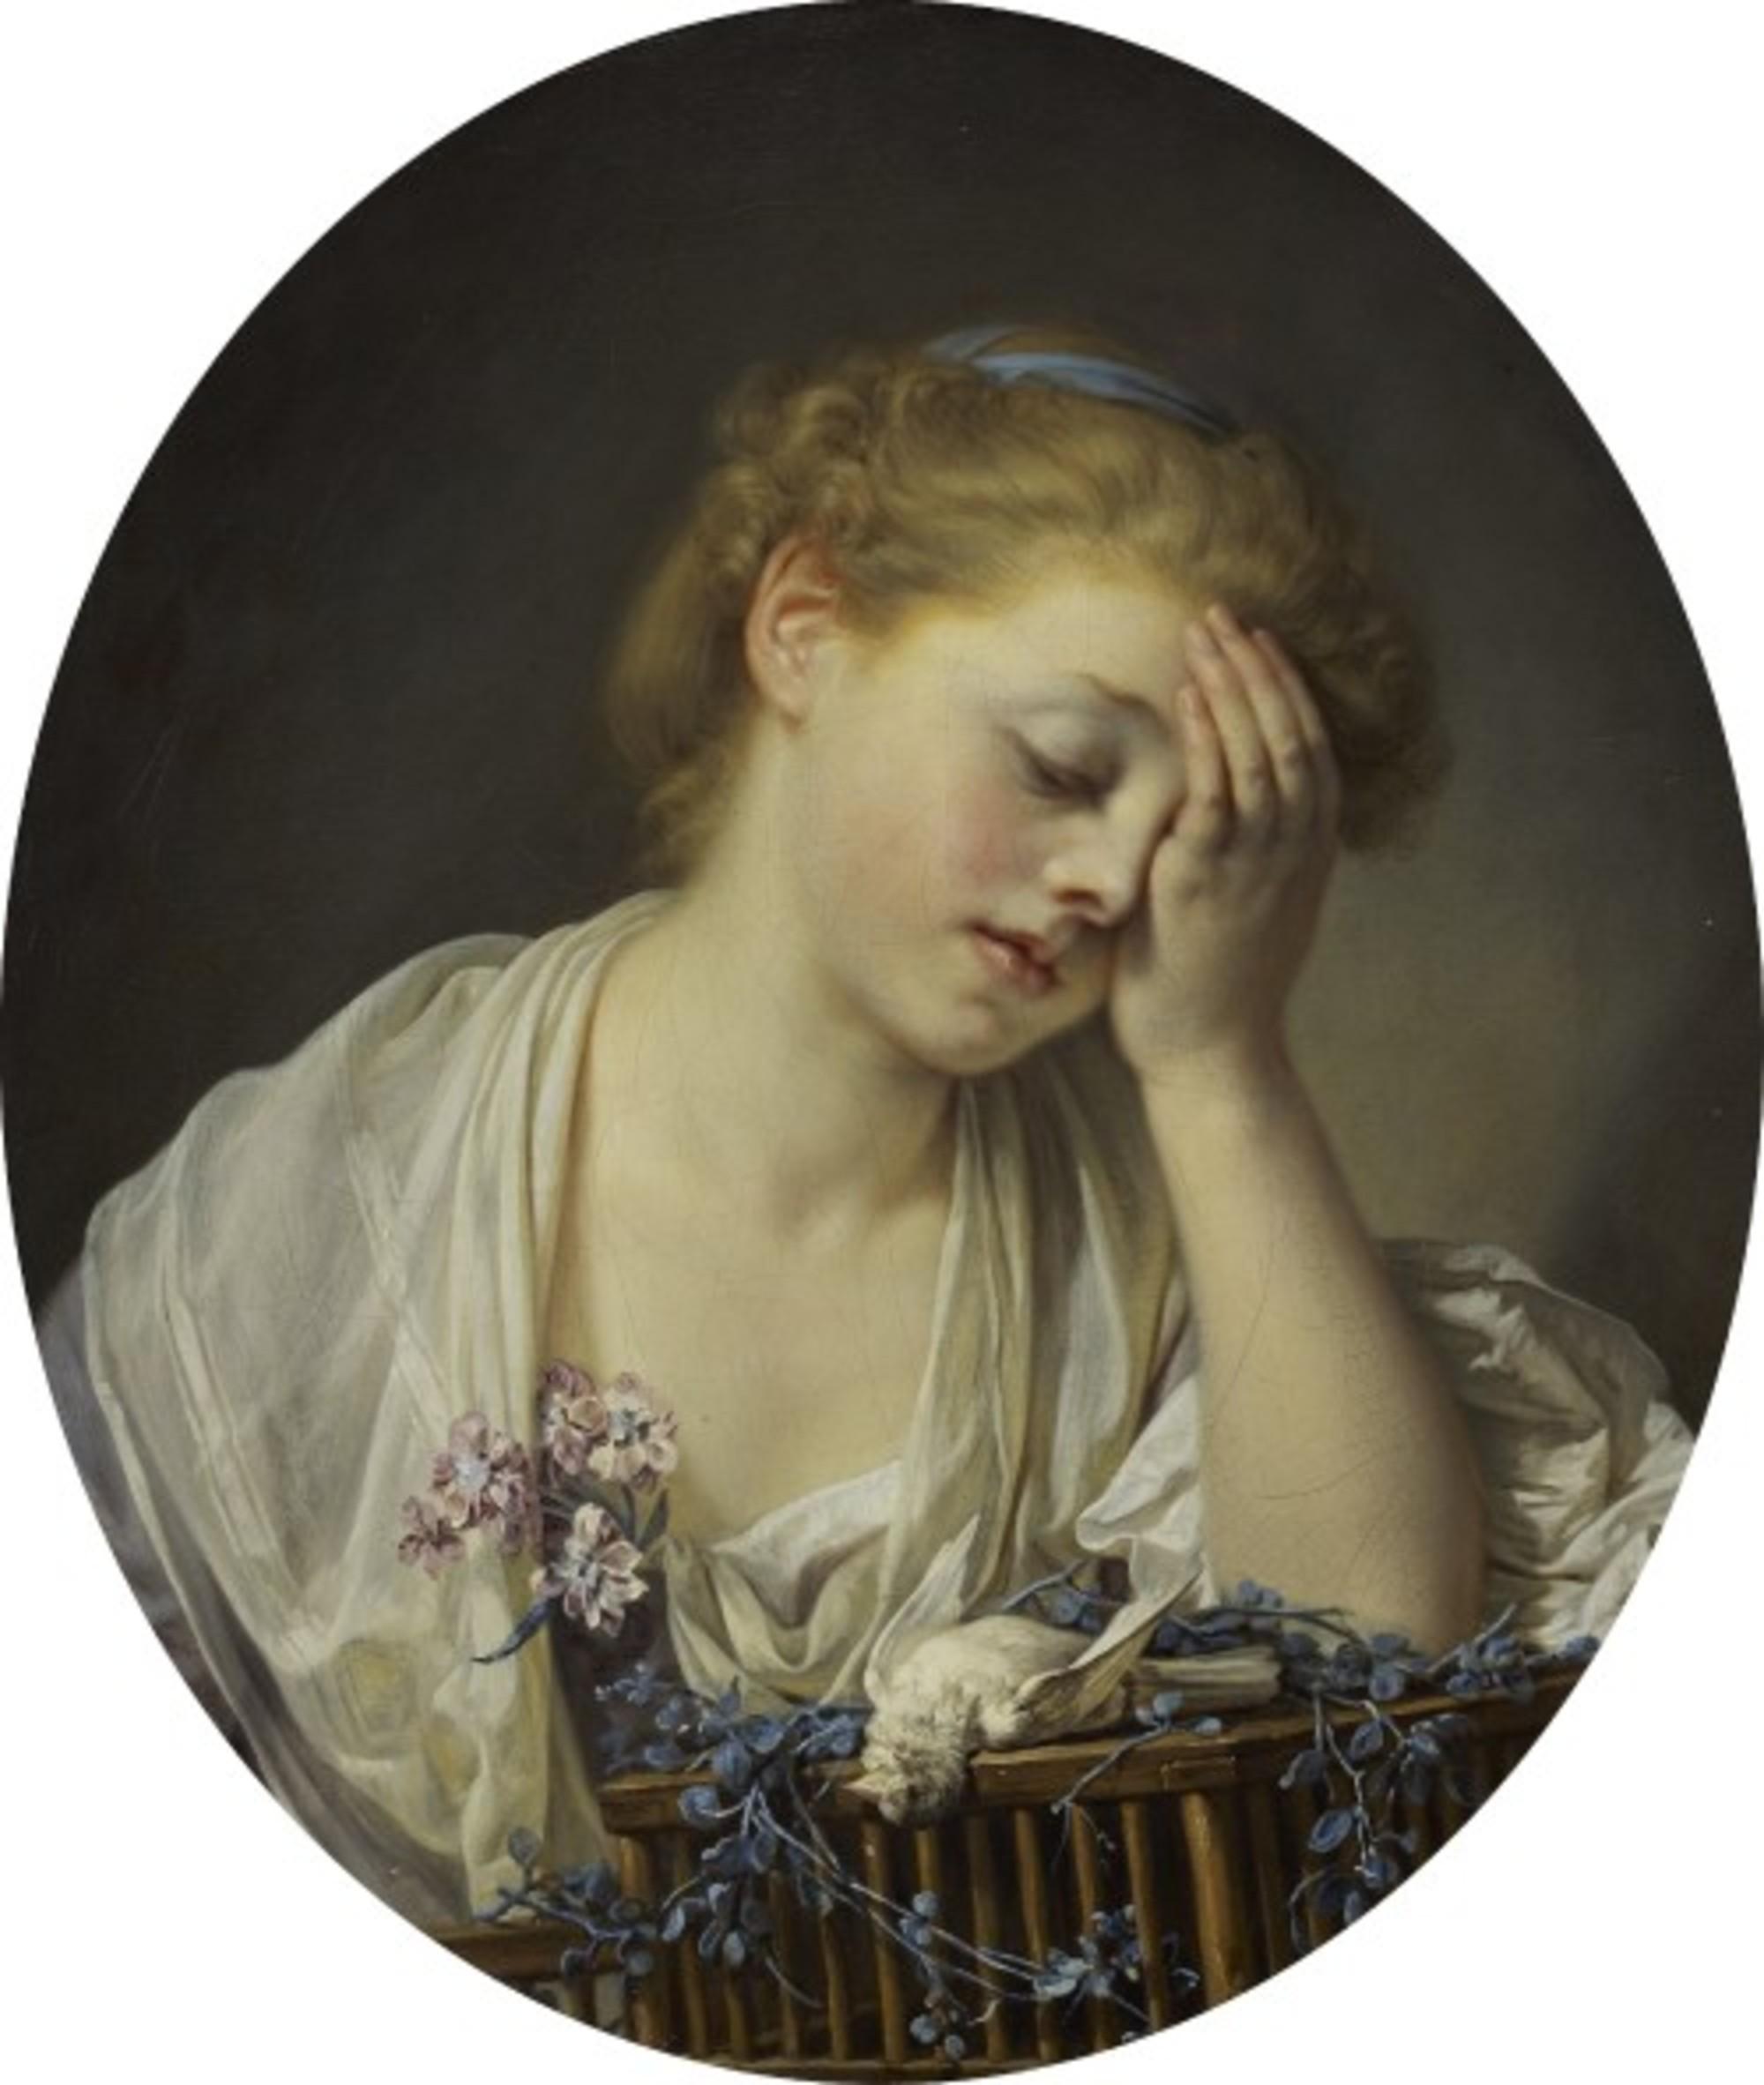 Jean-Baptiste-Greuze---A-Girl-with-a-Dead-Canary---Google-Art-Project.jpg